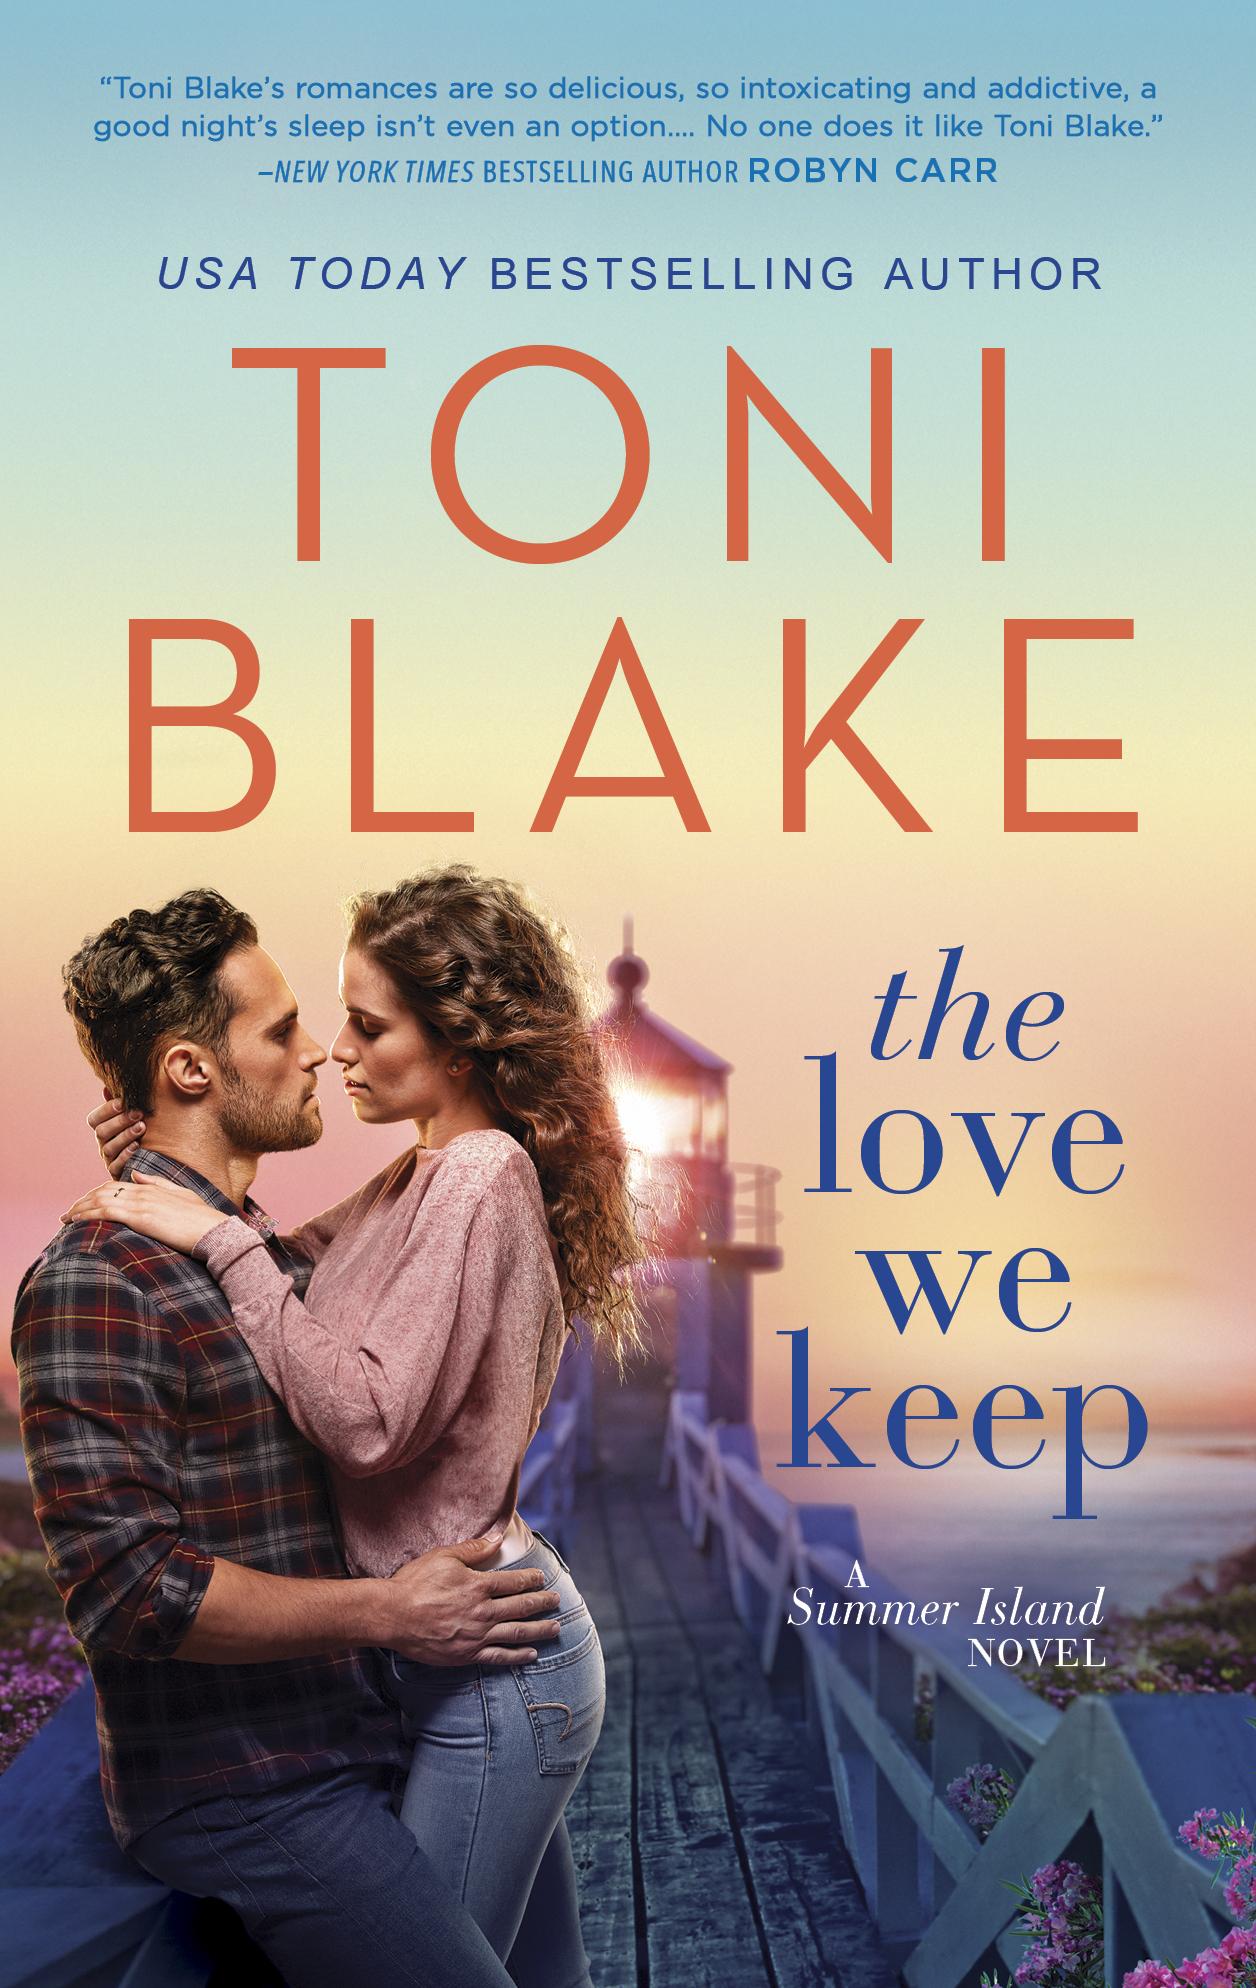 The Love We Keep A Summer Island Novel, Book 3 January 28, 2020